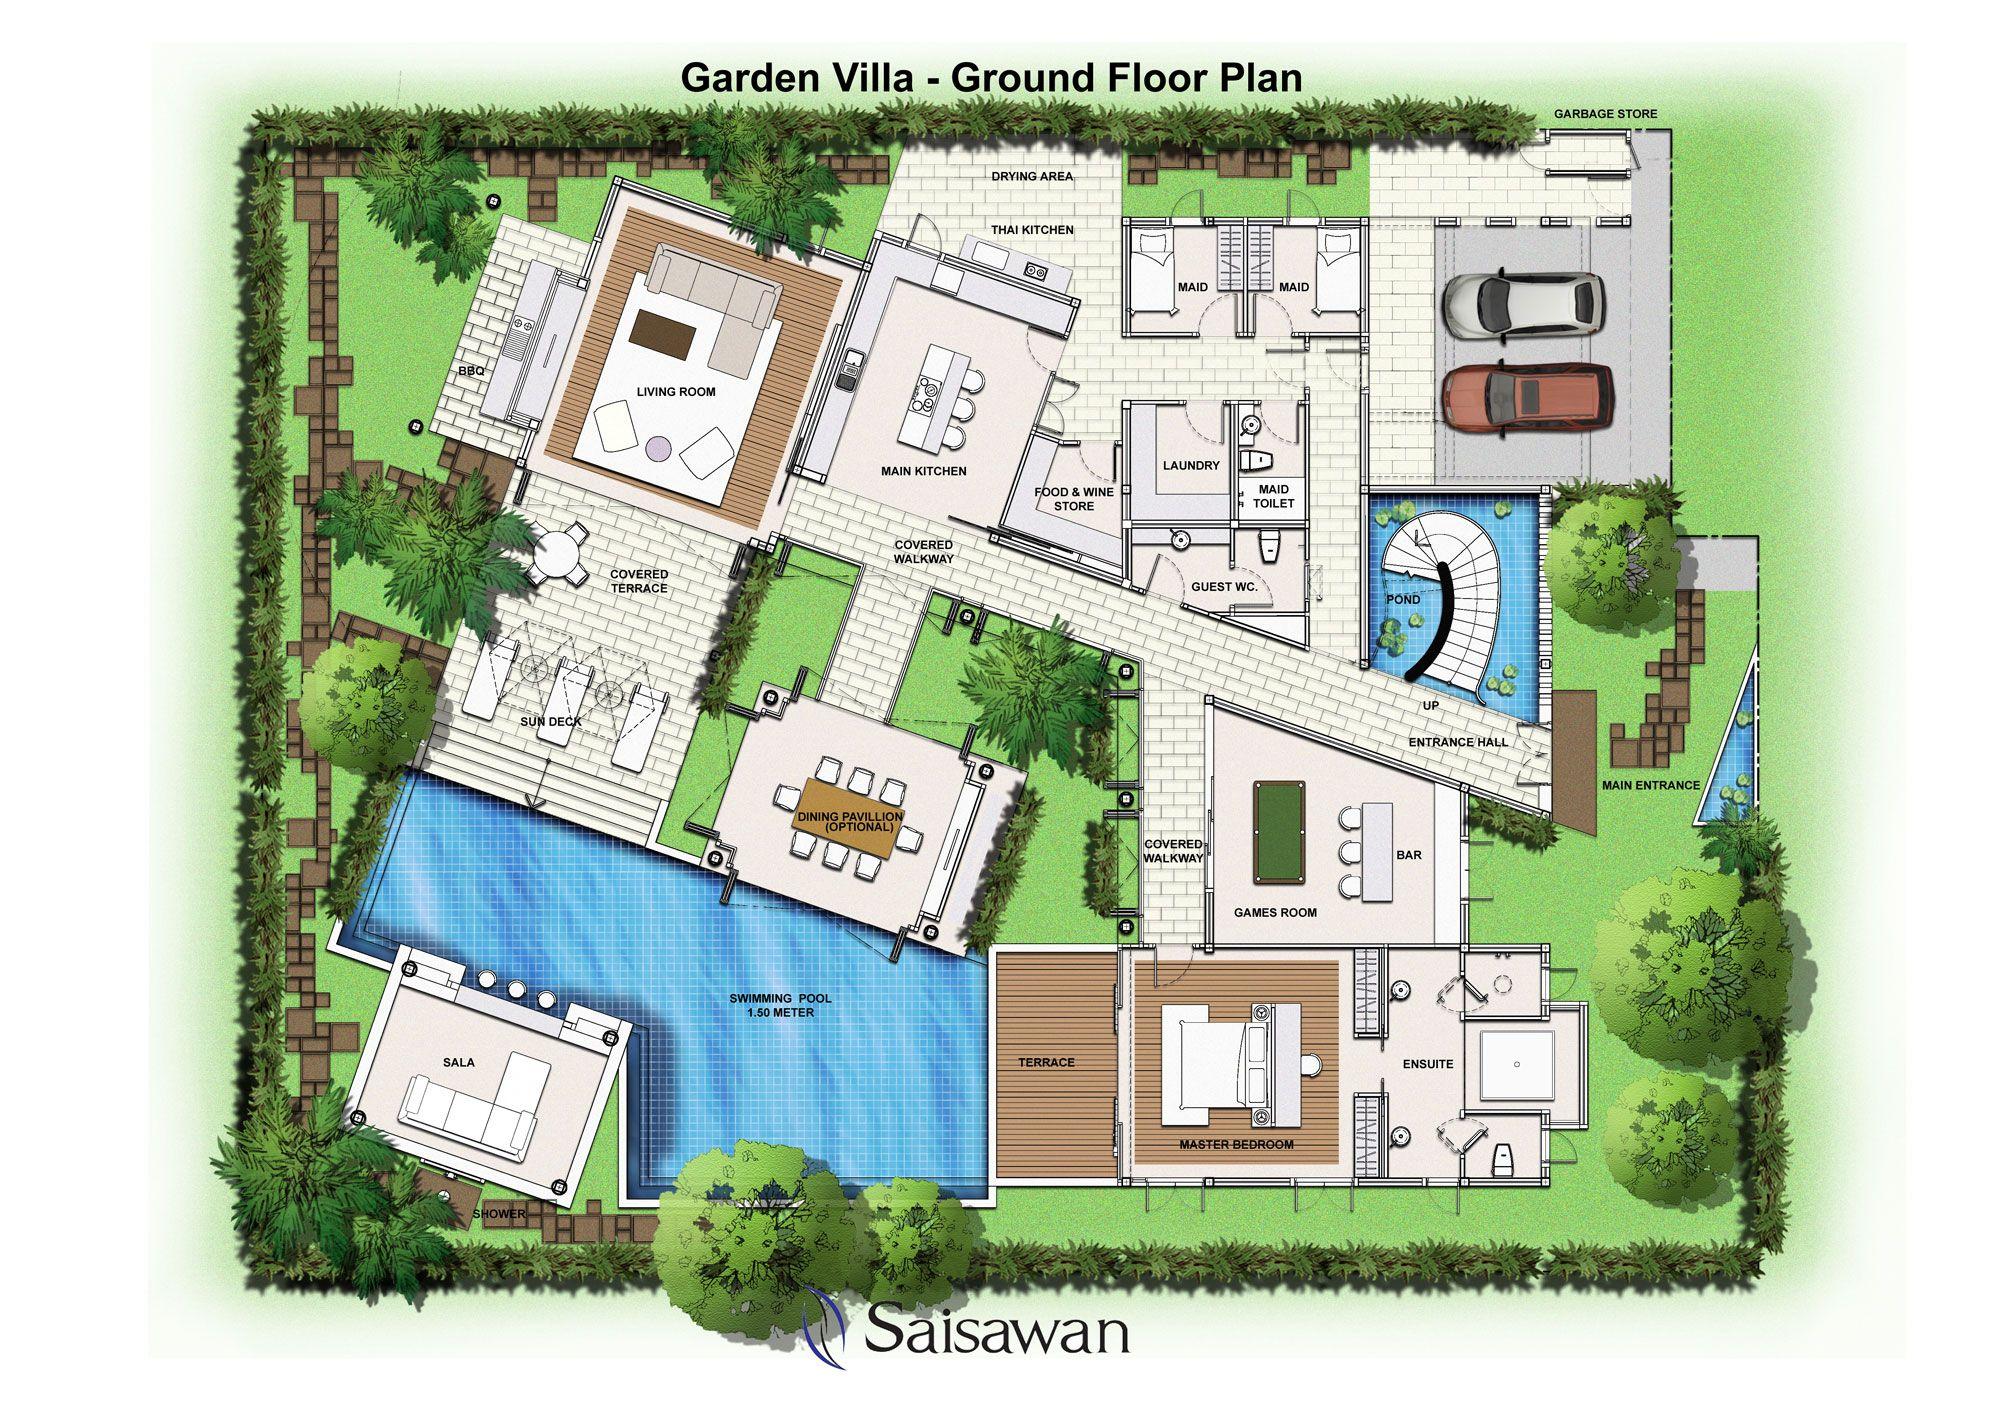 Saisawan Garden Villas Ground Floor Plan Floor plans